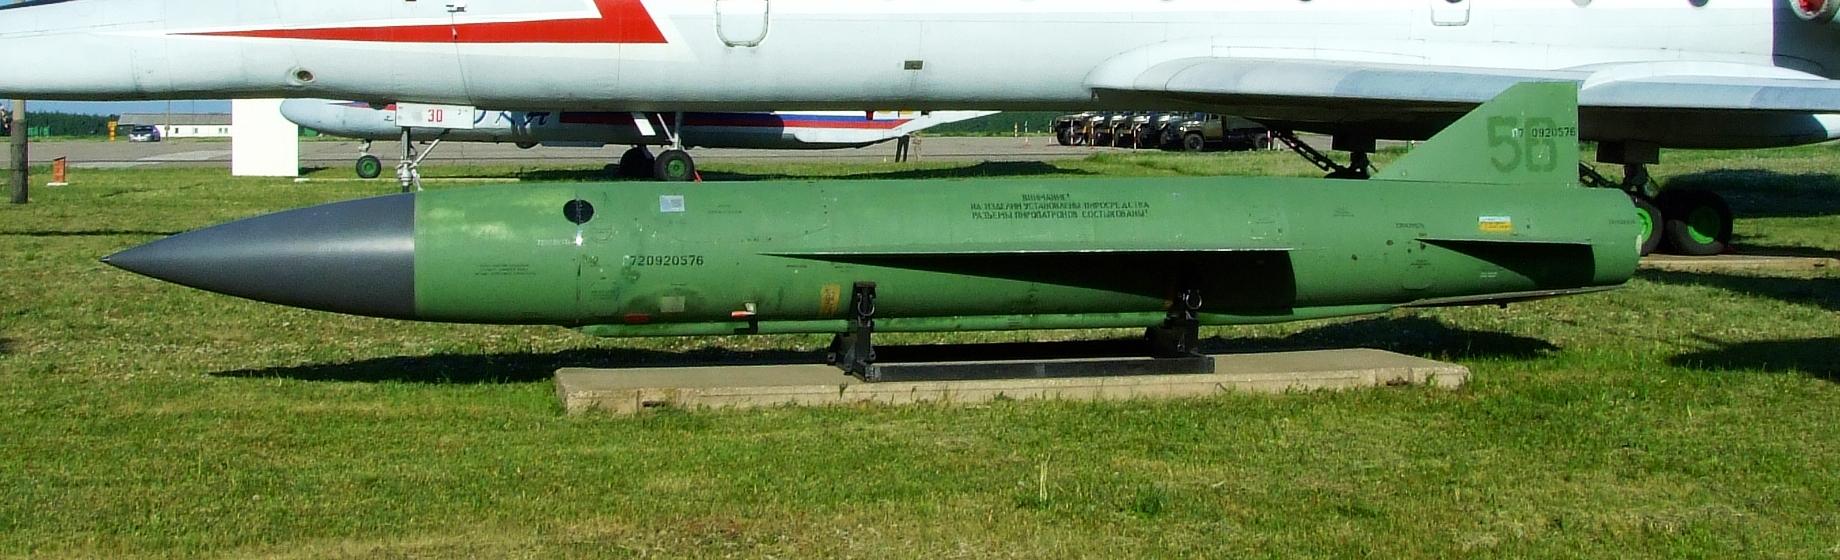 Raduga Kh-22 - Sursa: commons.wikimedia.org